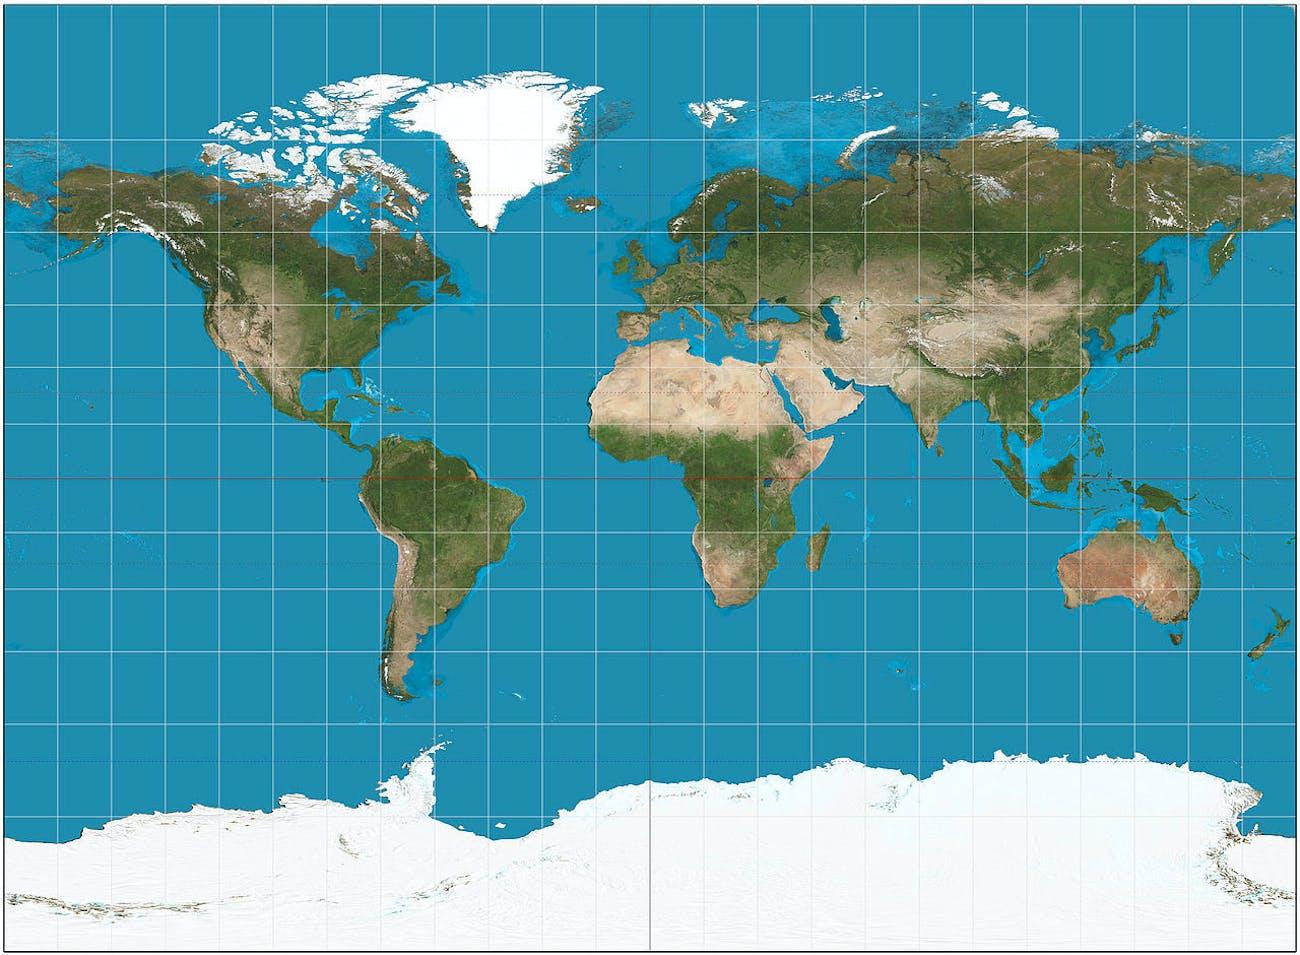 See Map Of The World.Hajime Narukawa Wins Good Design Grand Award For World Changing Map